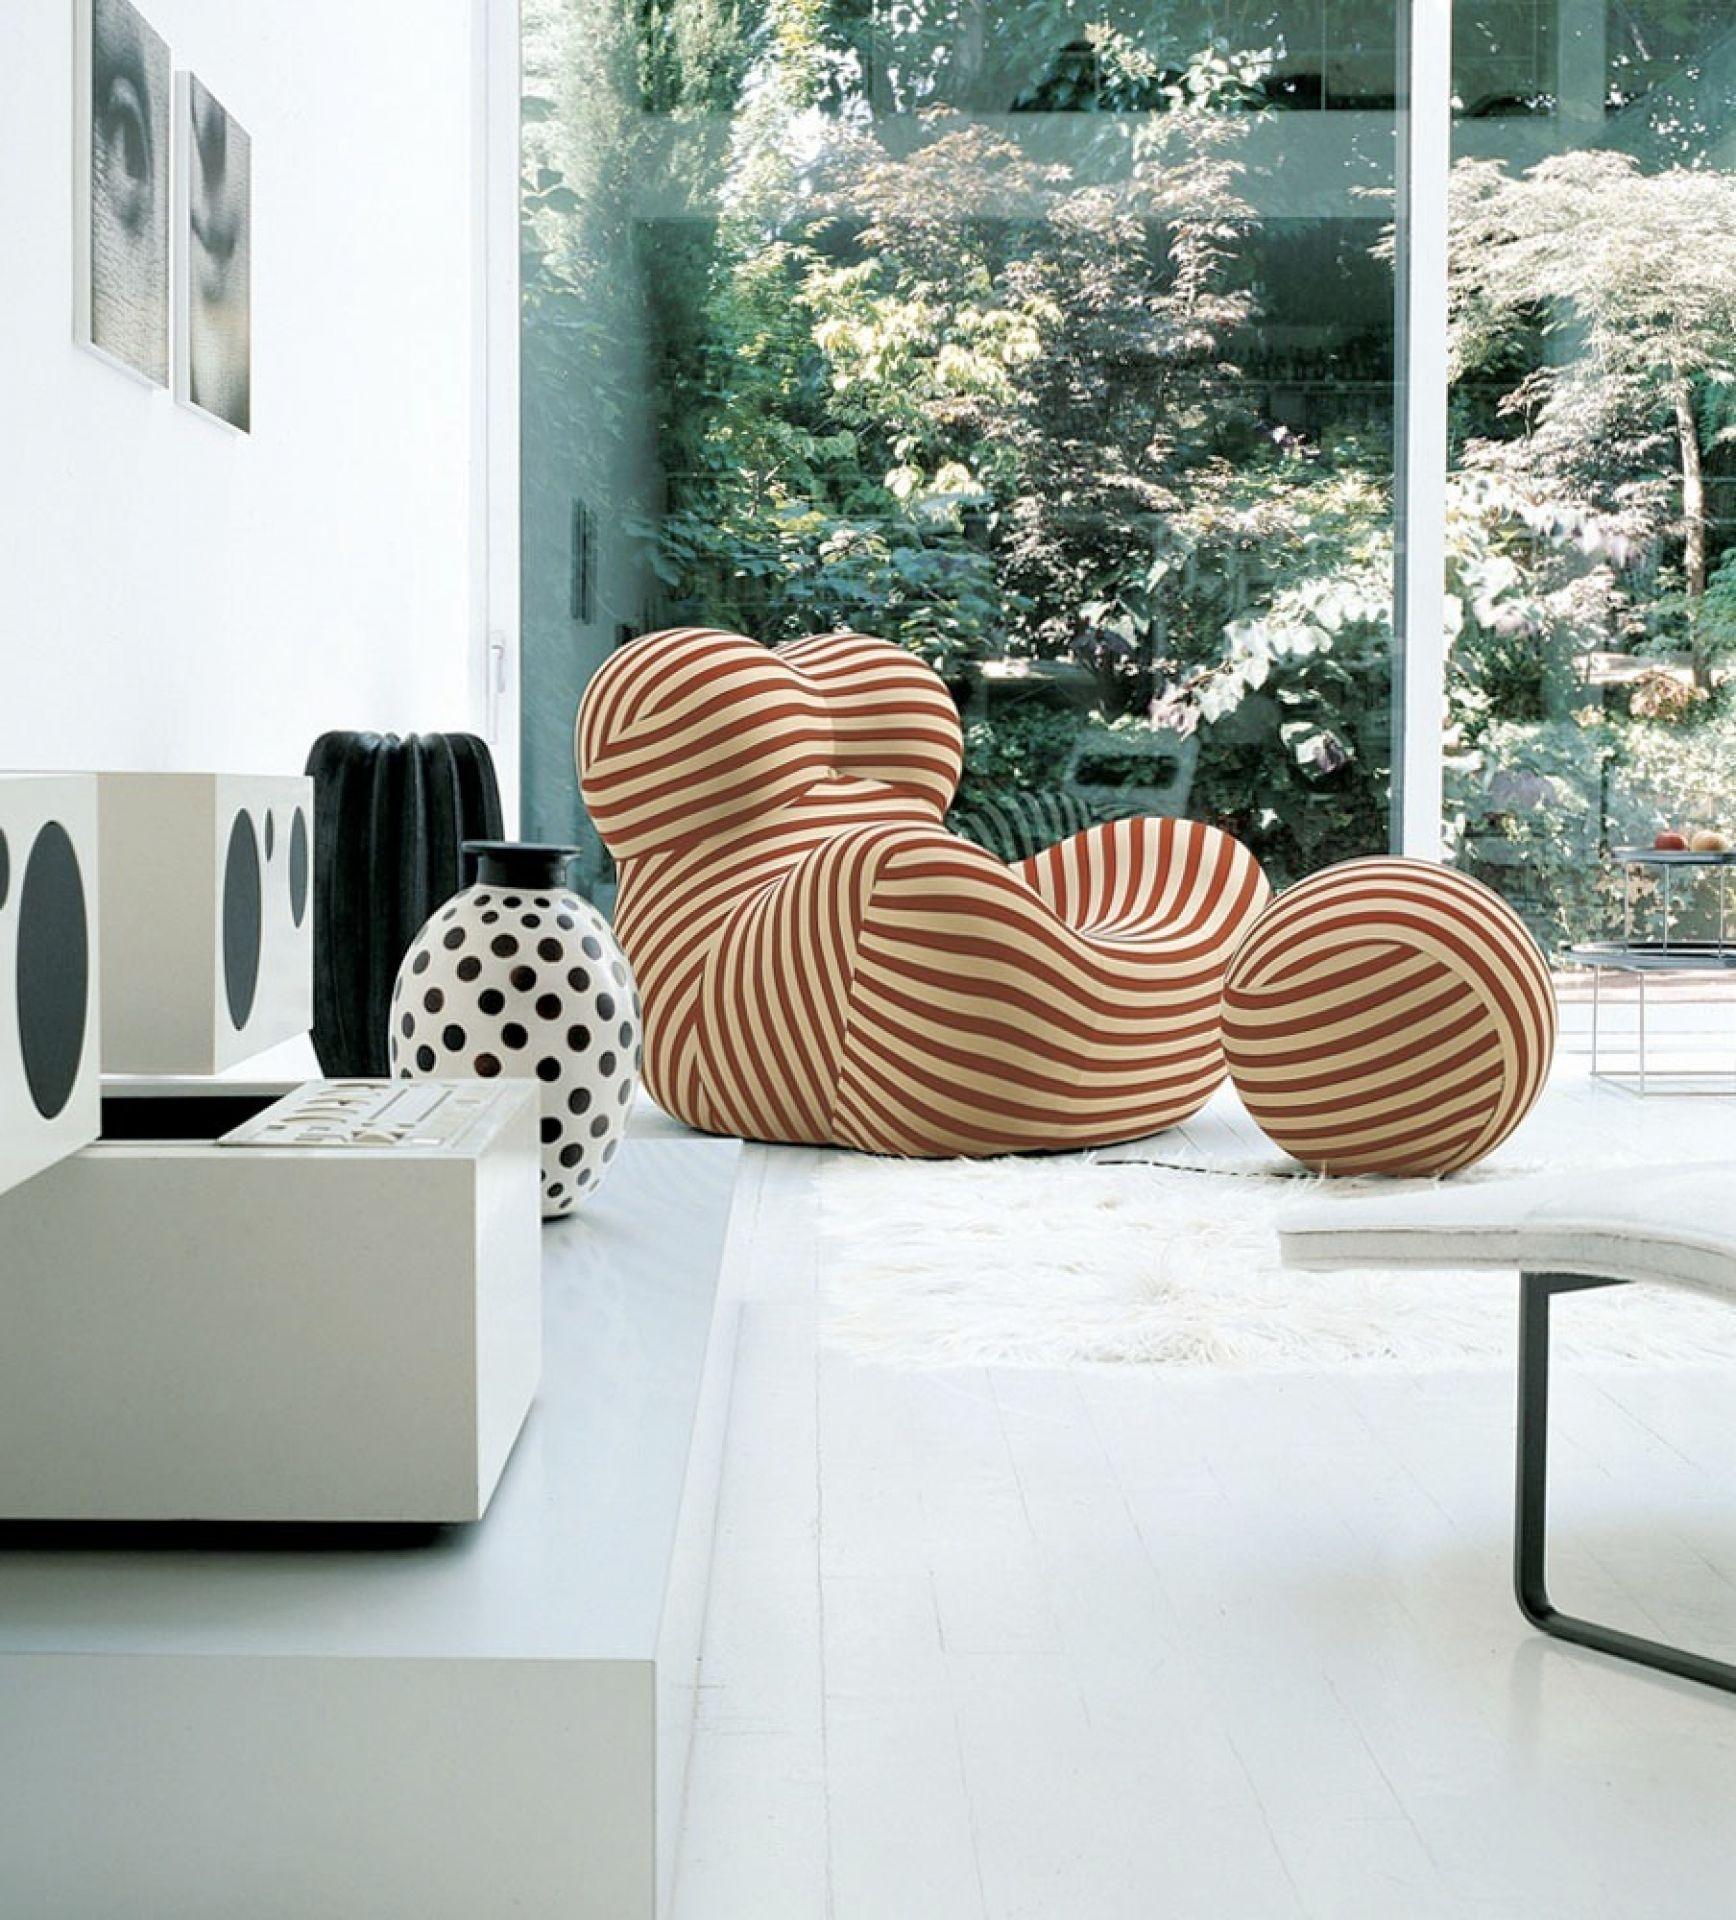 La Mamma Up5 and UP6 Chair Series UP2000 B&B Italia